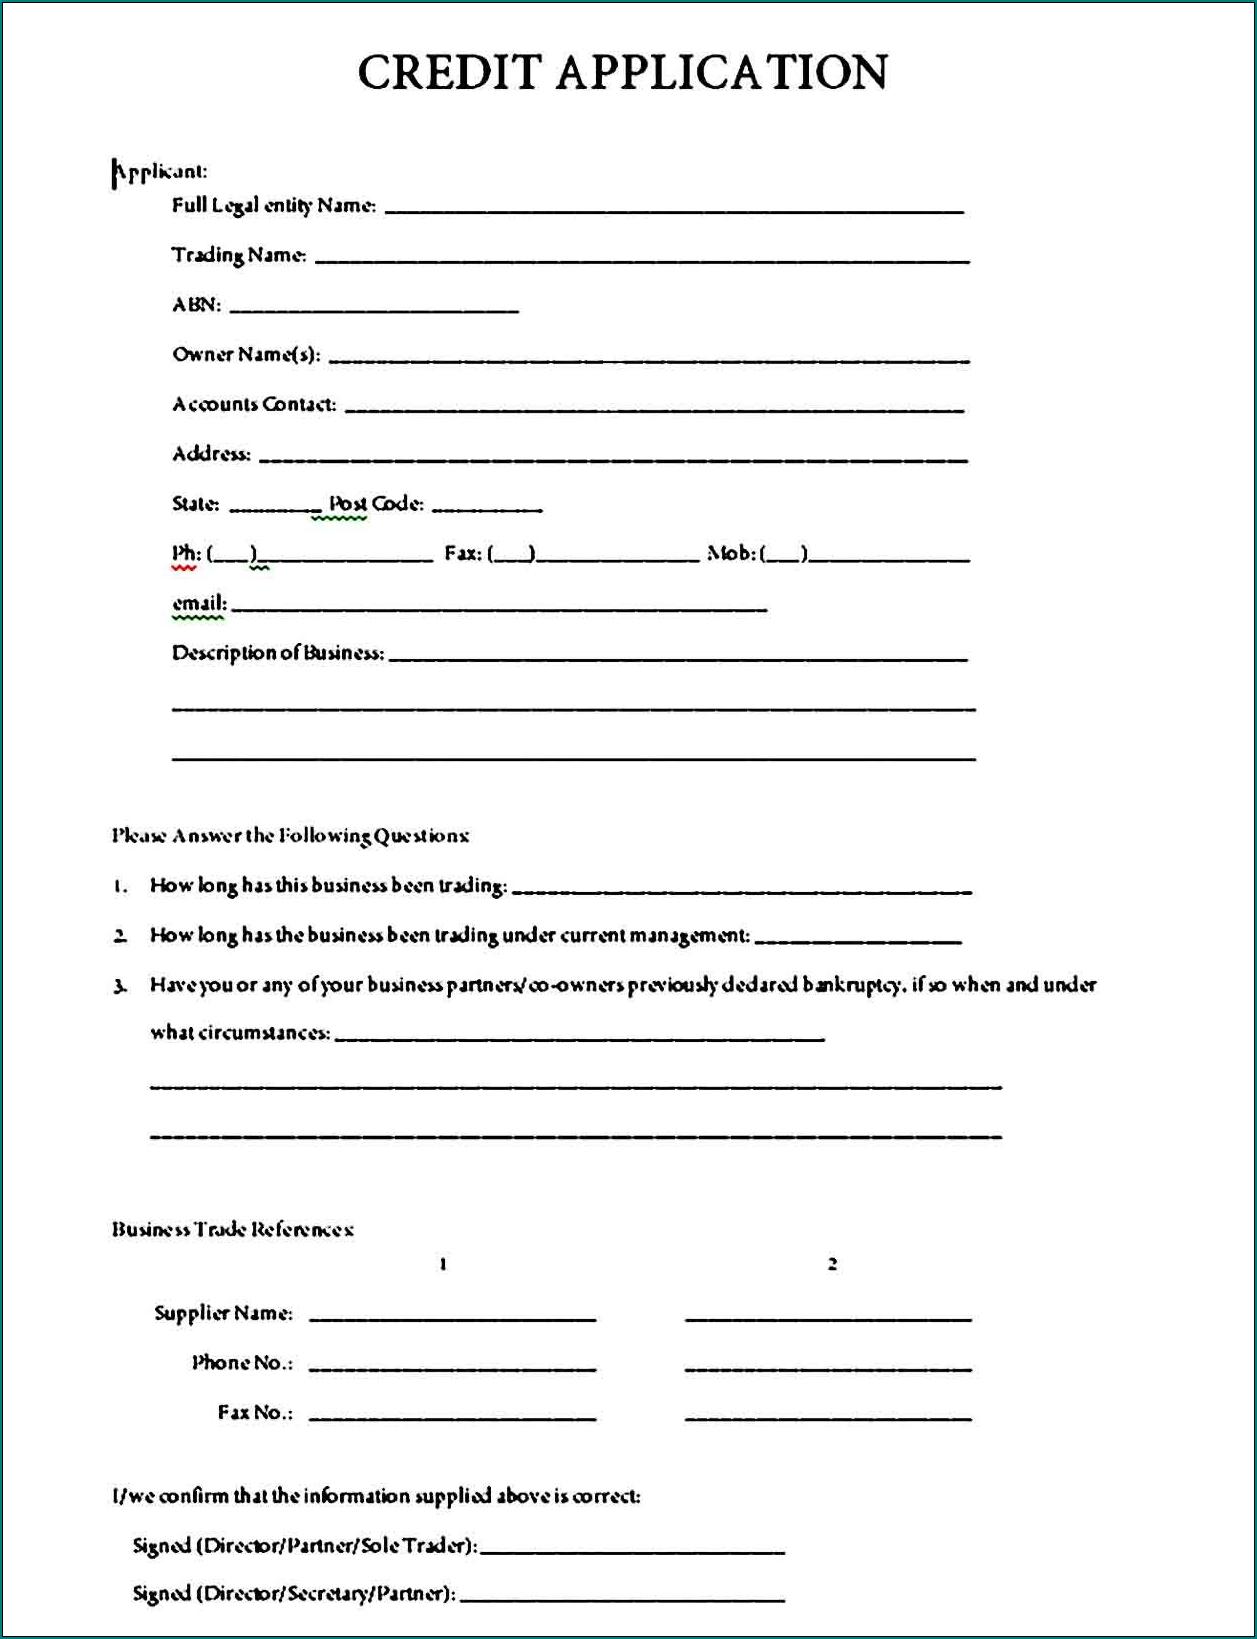 Credit Application Template Sample